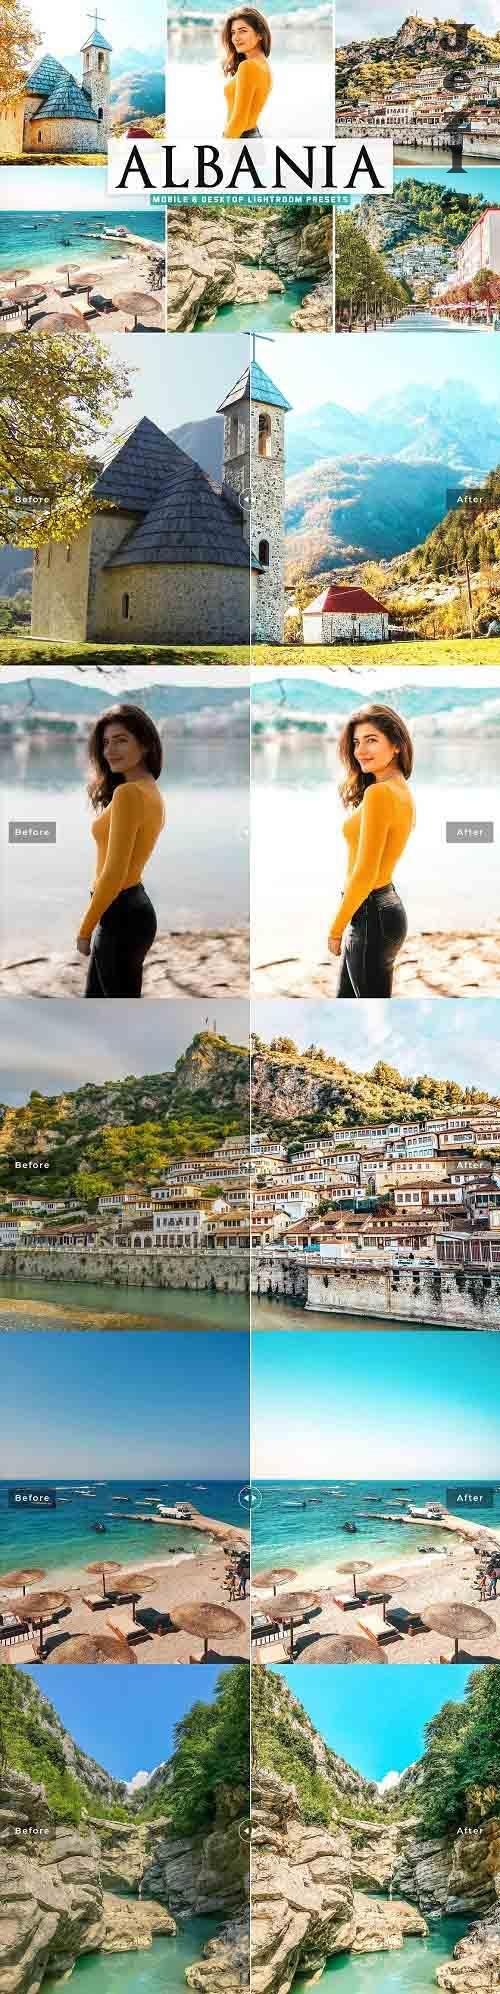 Albania Pro Lightroom Presets - 5614004 - Mobile & Desktop